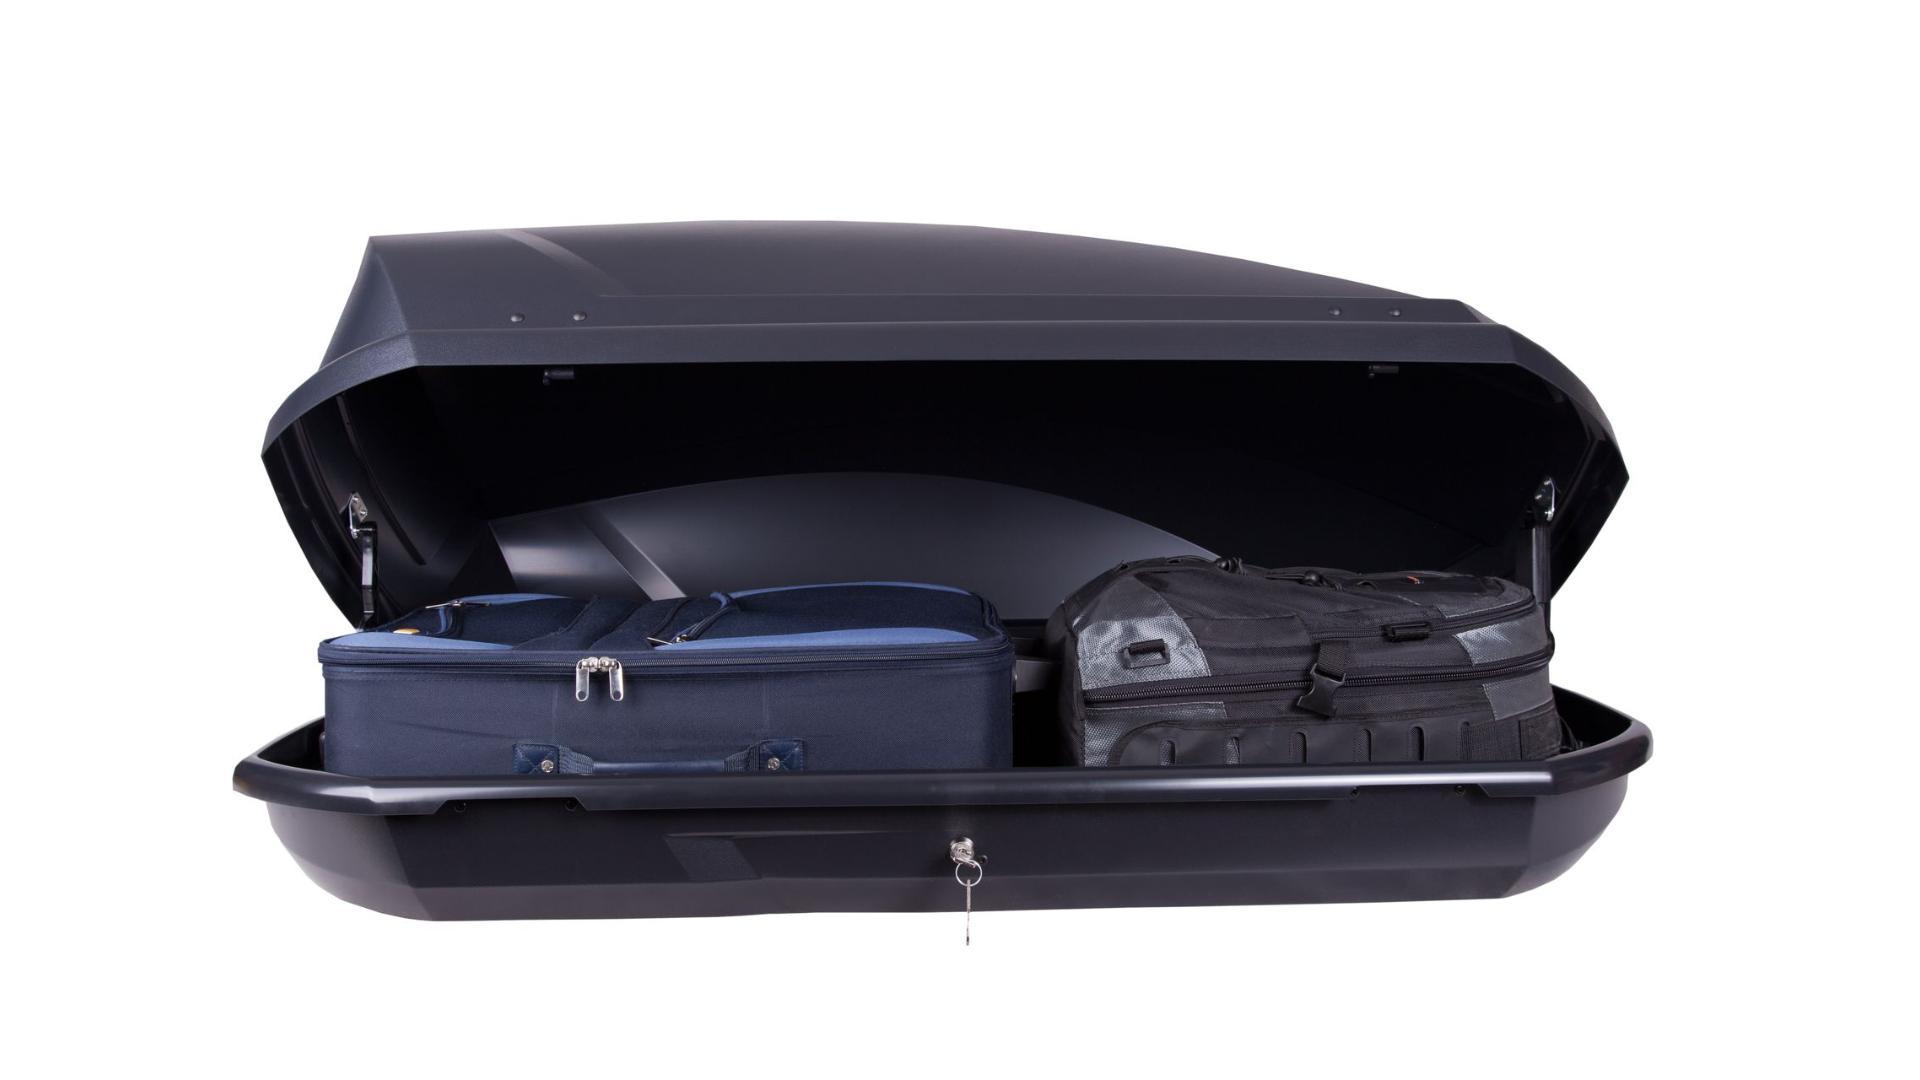 Taurus strešný box Adventure (131 x 72 x 37) 295l. - čierny matný